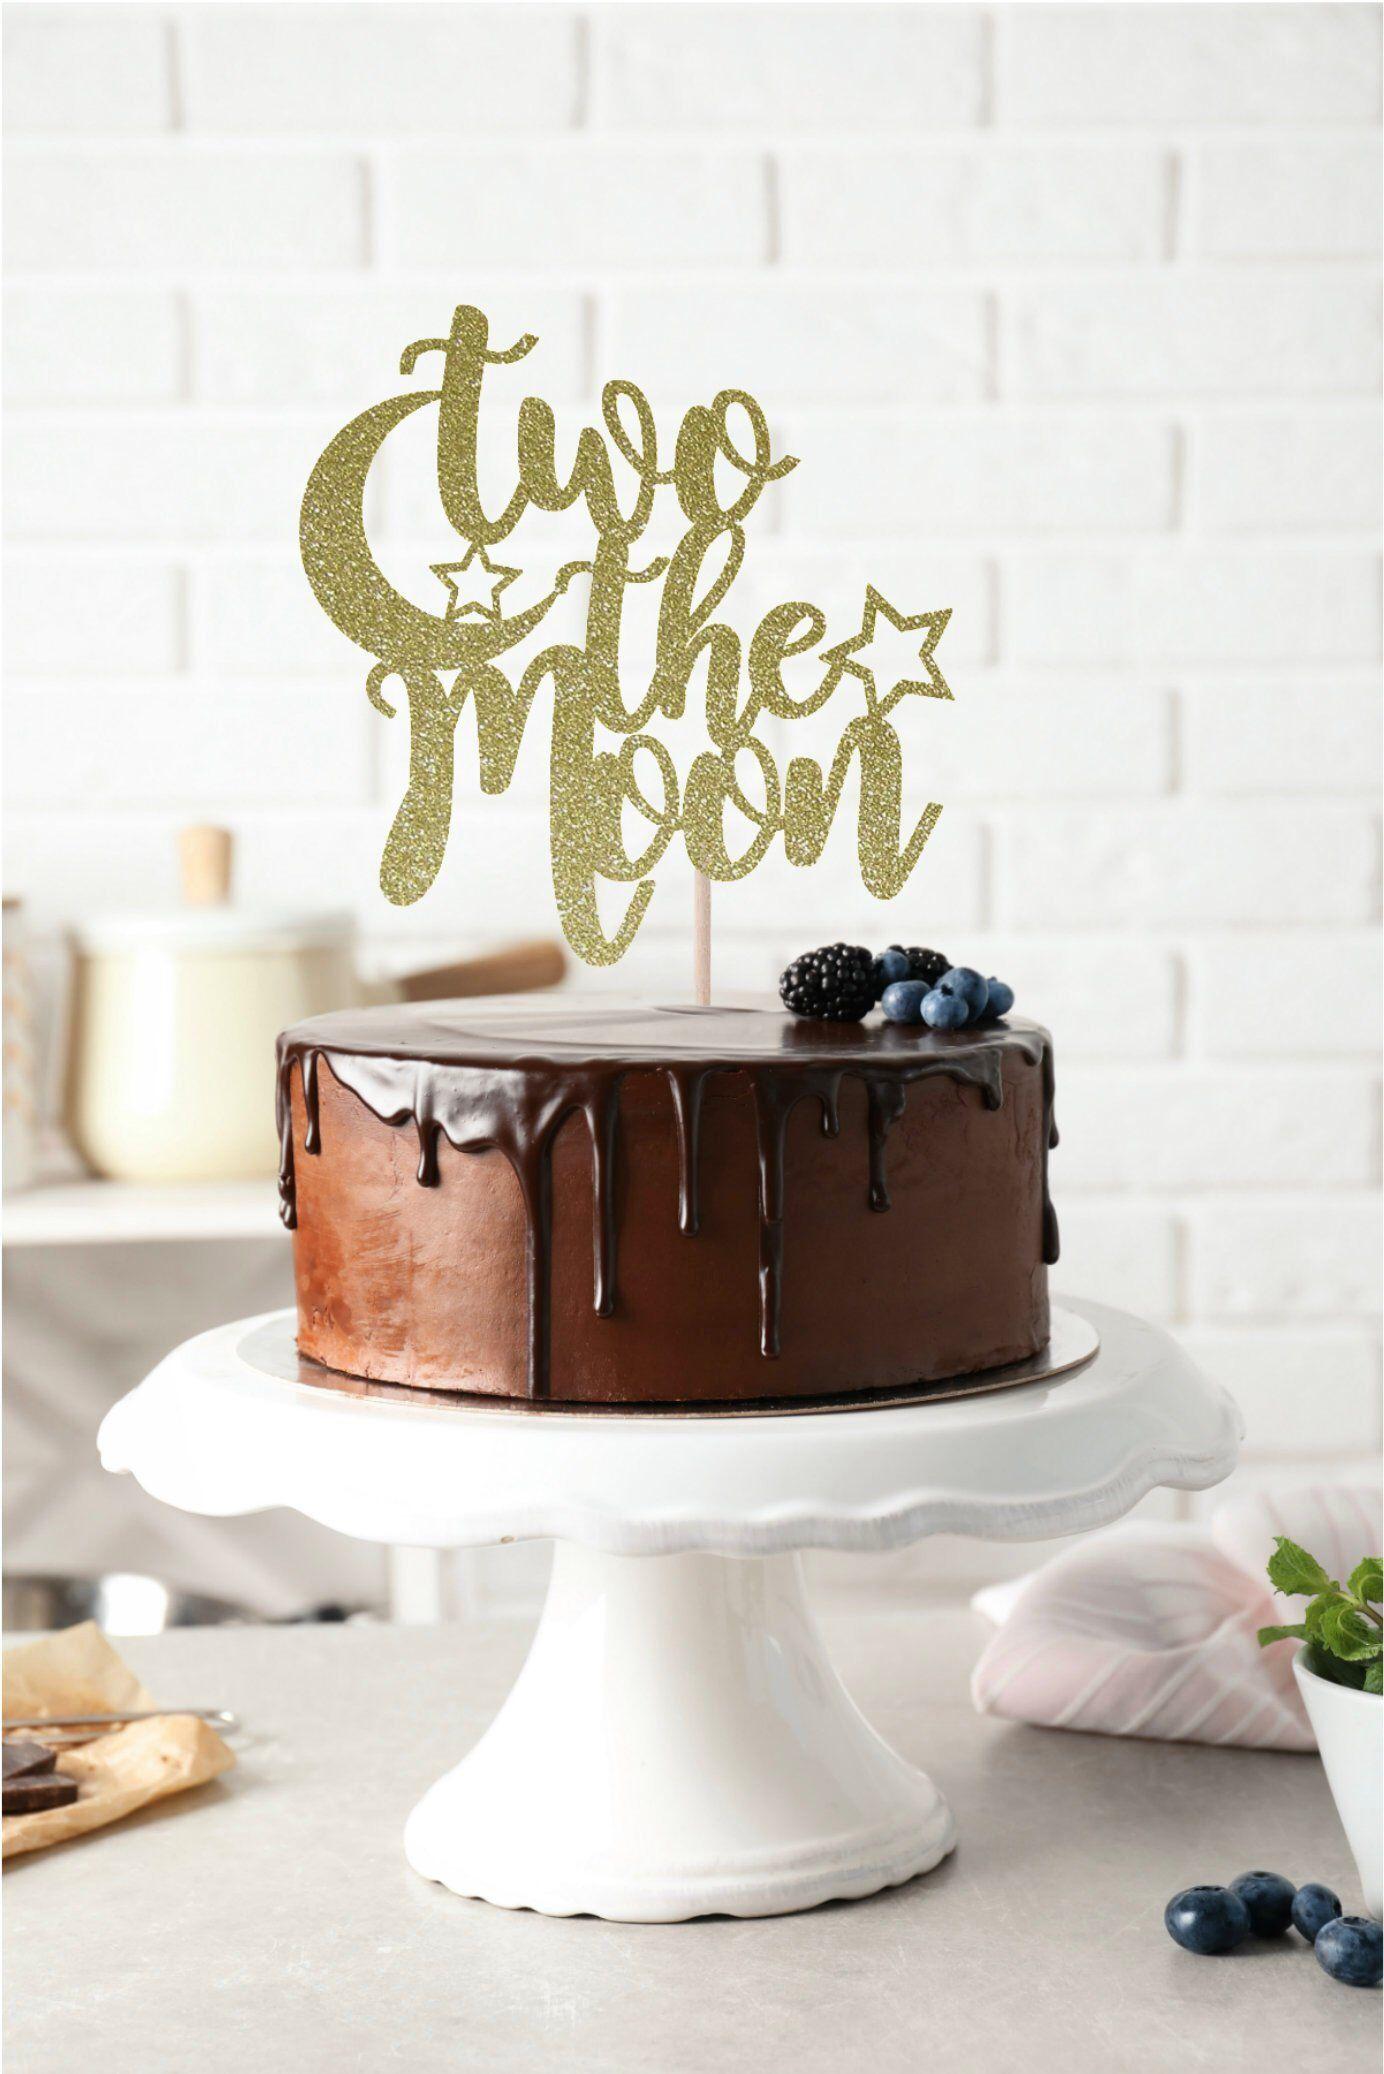 Remarkable Personalised Birthday Cake Decoration 2Nd Birthday Cake Topper Funny Birthday Cards Online Chimdamsfinfo